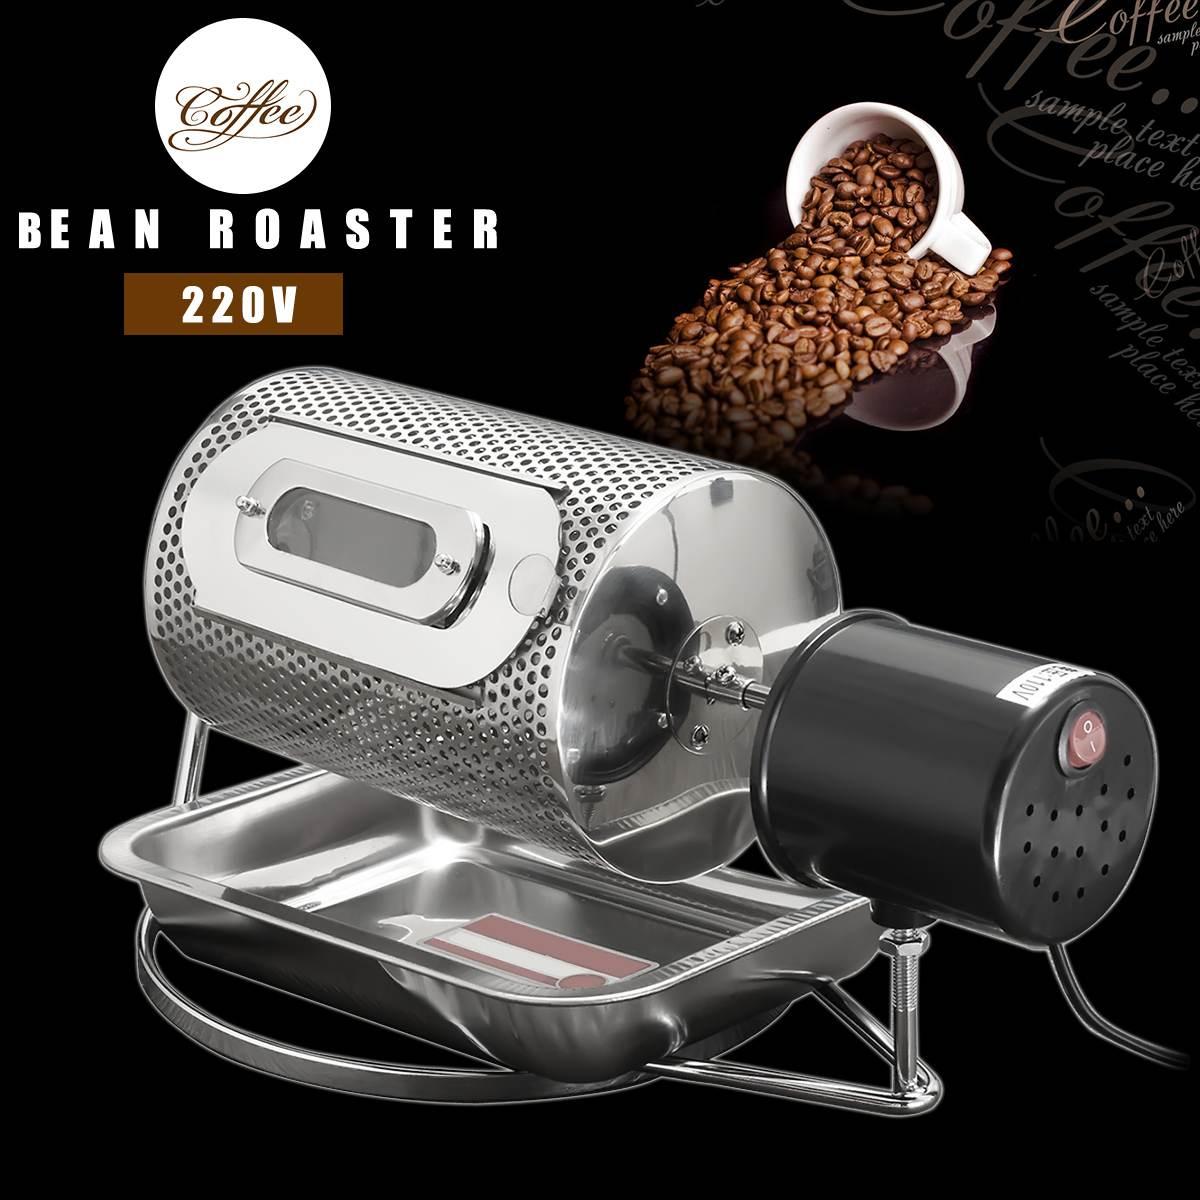 Becornce Stainless Steel Coffee Bean Roasting Machine Coffee Roaster Roller Baker 220V Tools Baking Fry Peanut Grain Nuts Dryer(China)